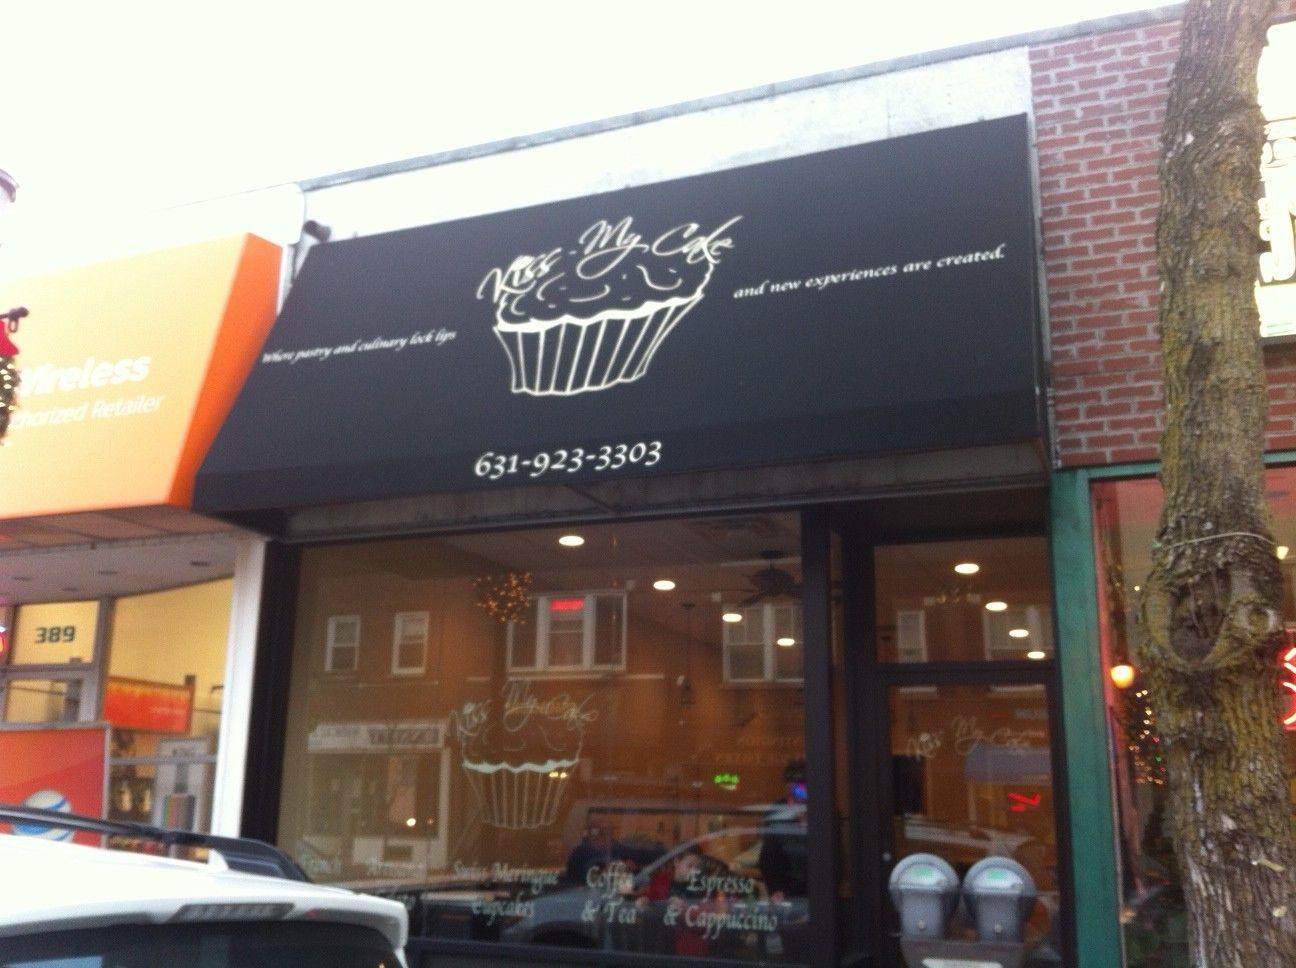 Kiss My Cake Storefront 1296x968 Pixels